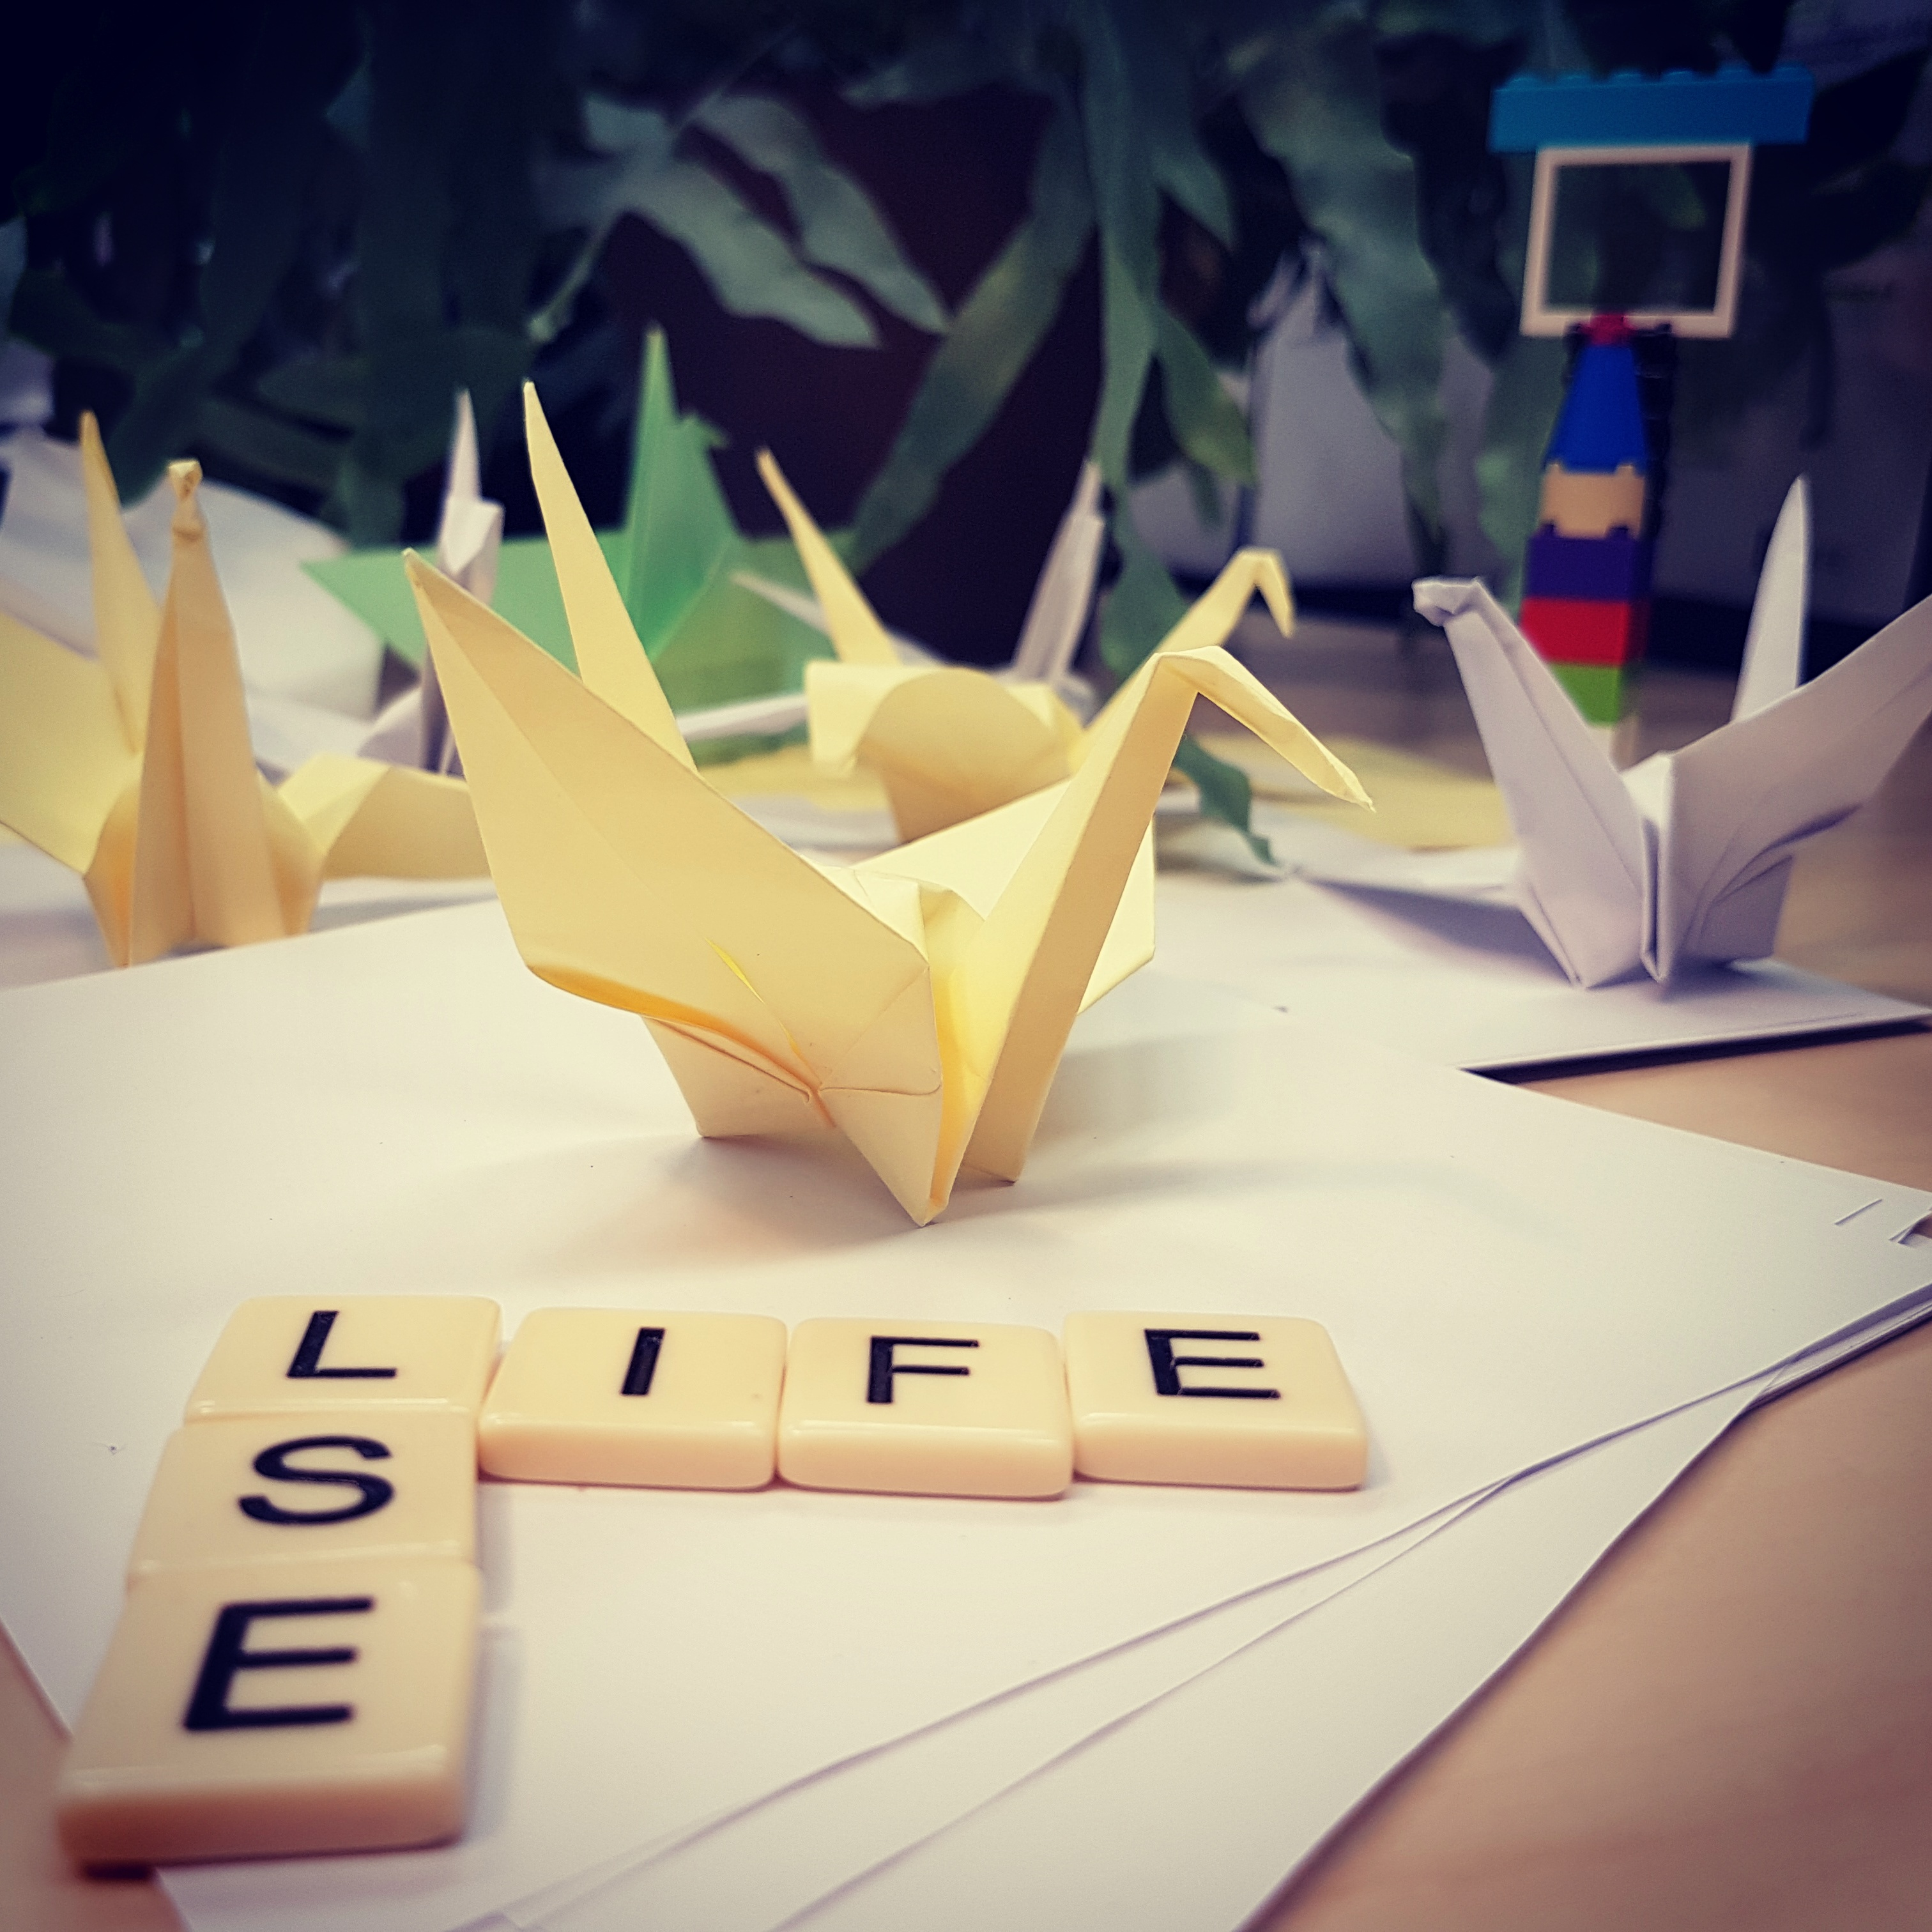 LSE Life